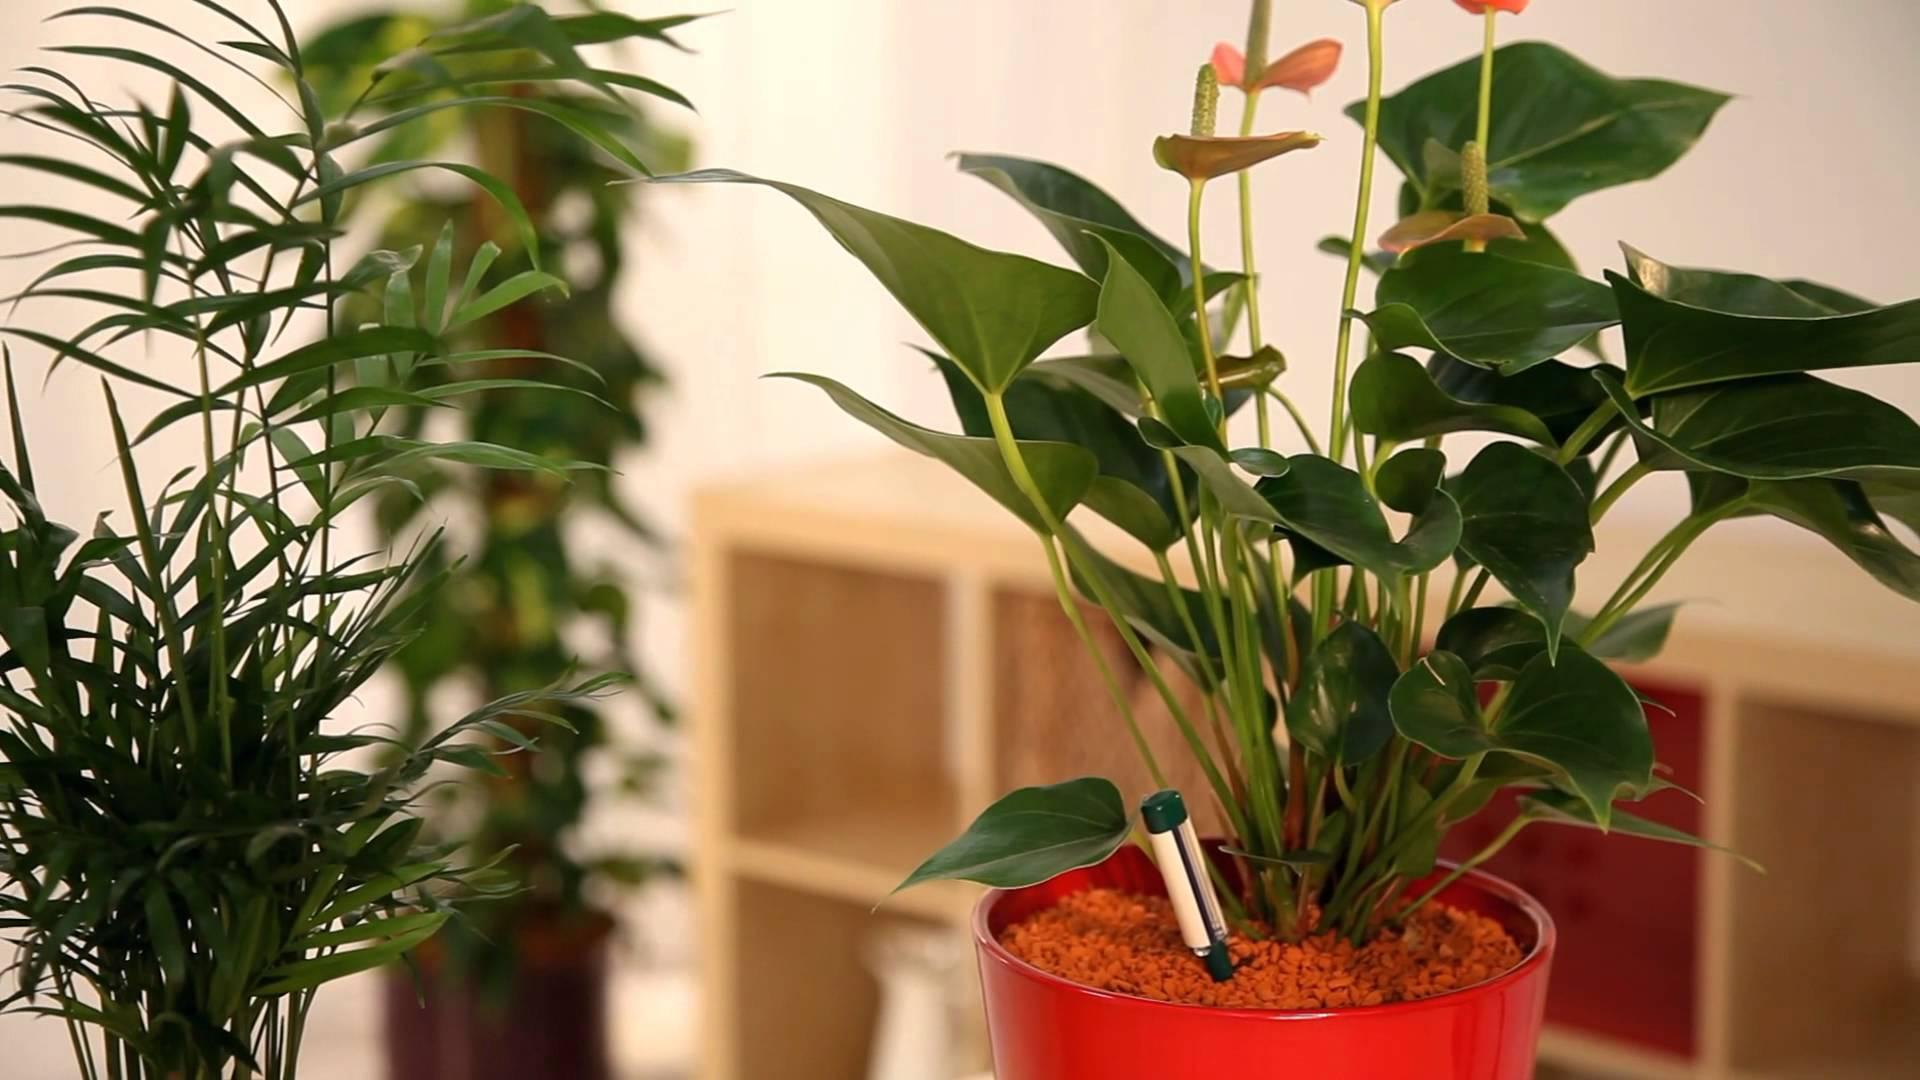 comment rempoter une plante verte. Black Bedroom Furniture Sets. Home Design Ideas